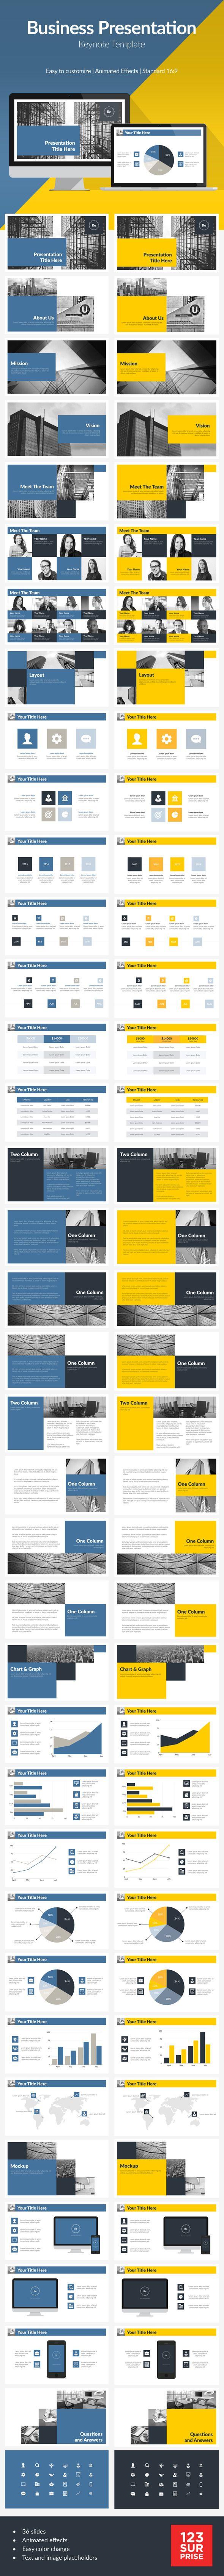 25 best ideas about Business Presentation Templates – Business Presentation Template